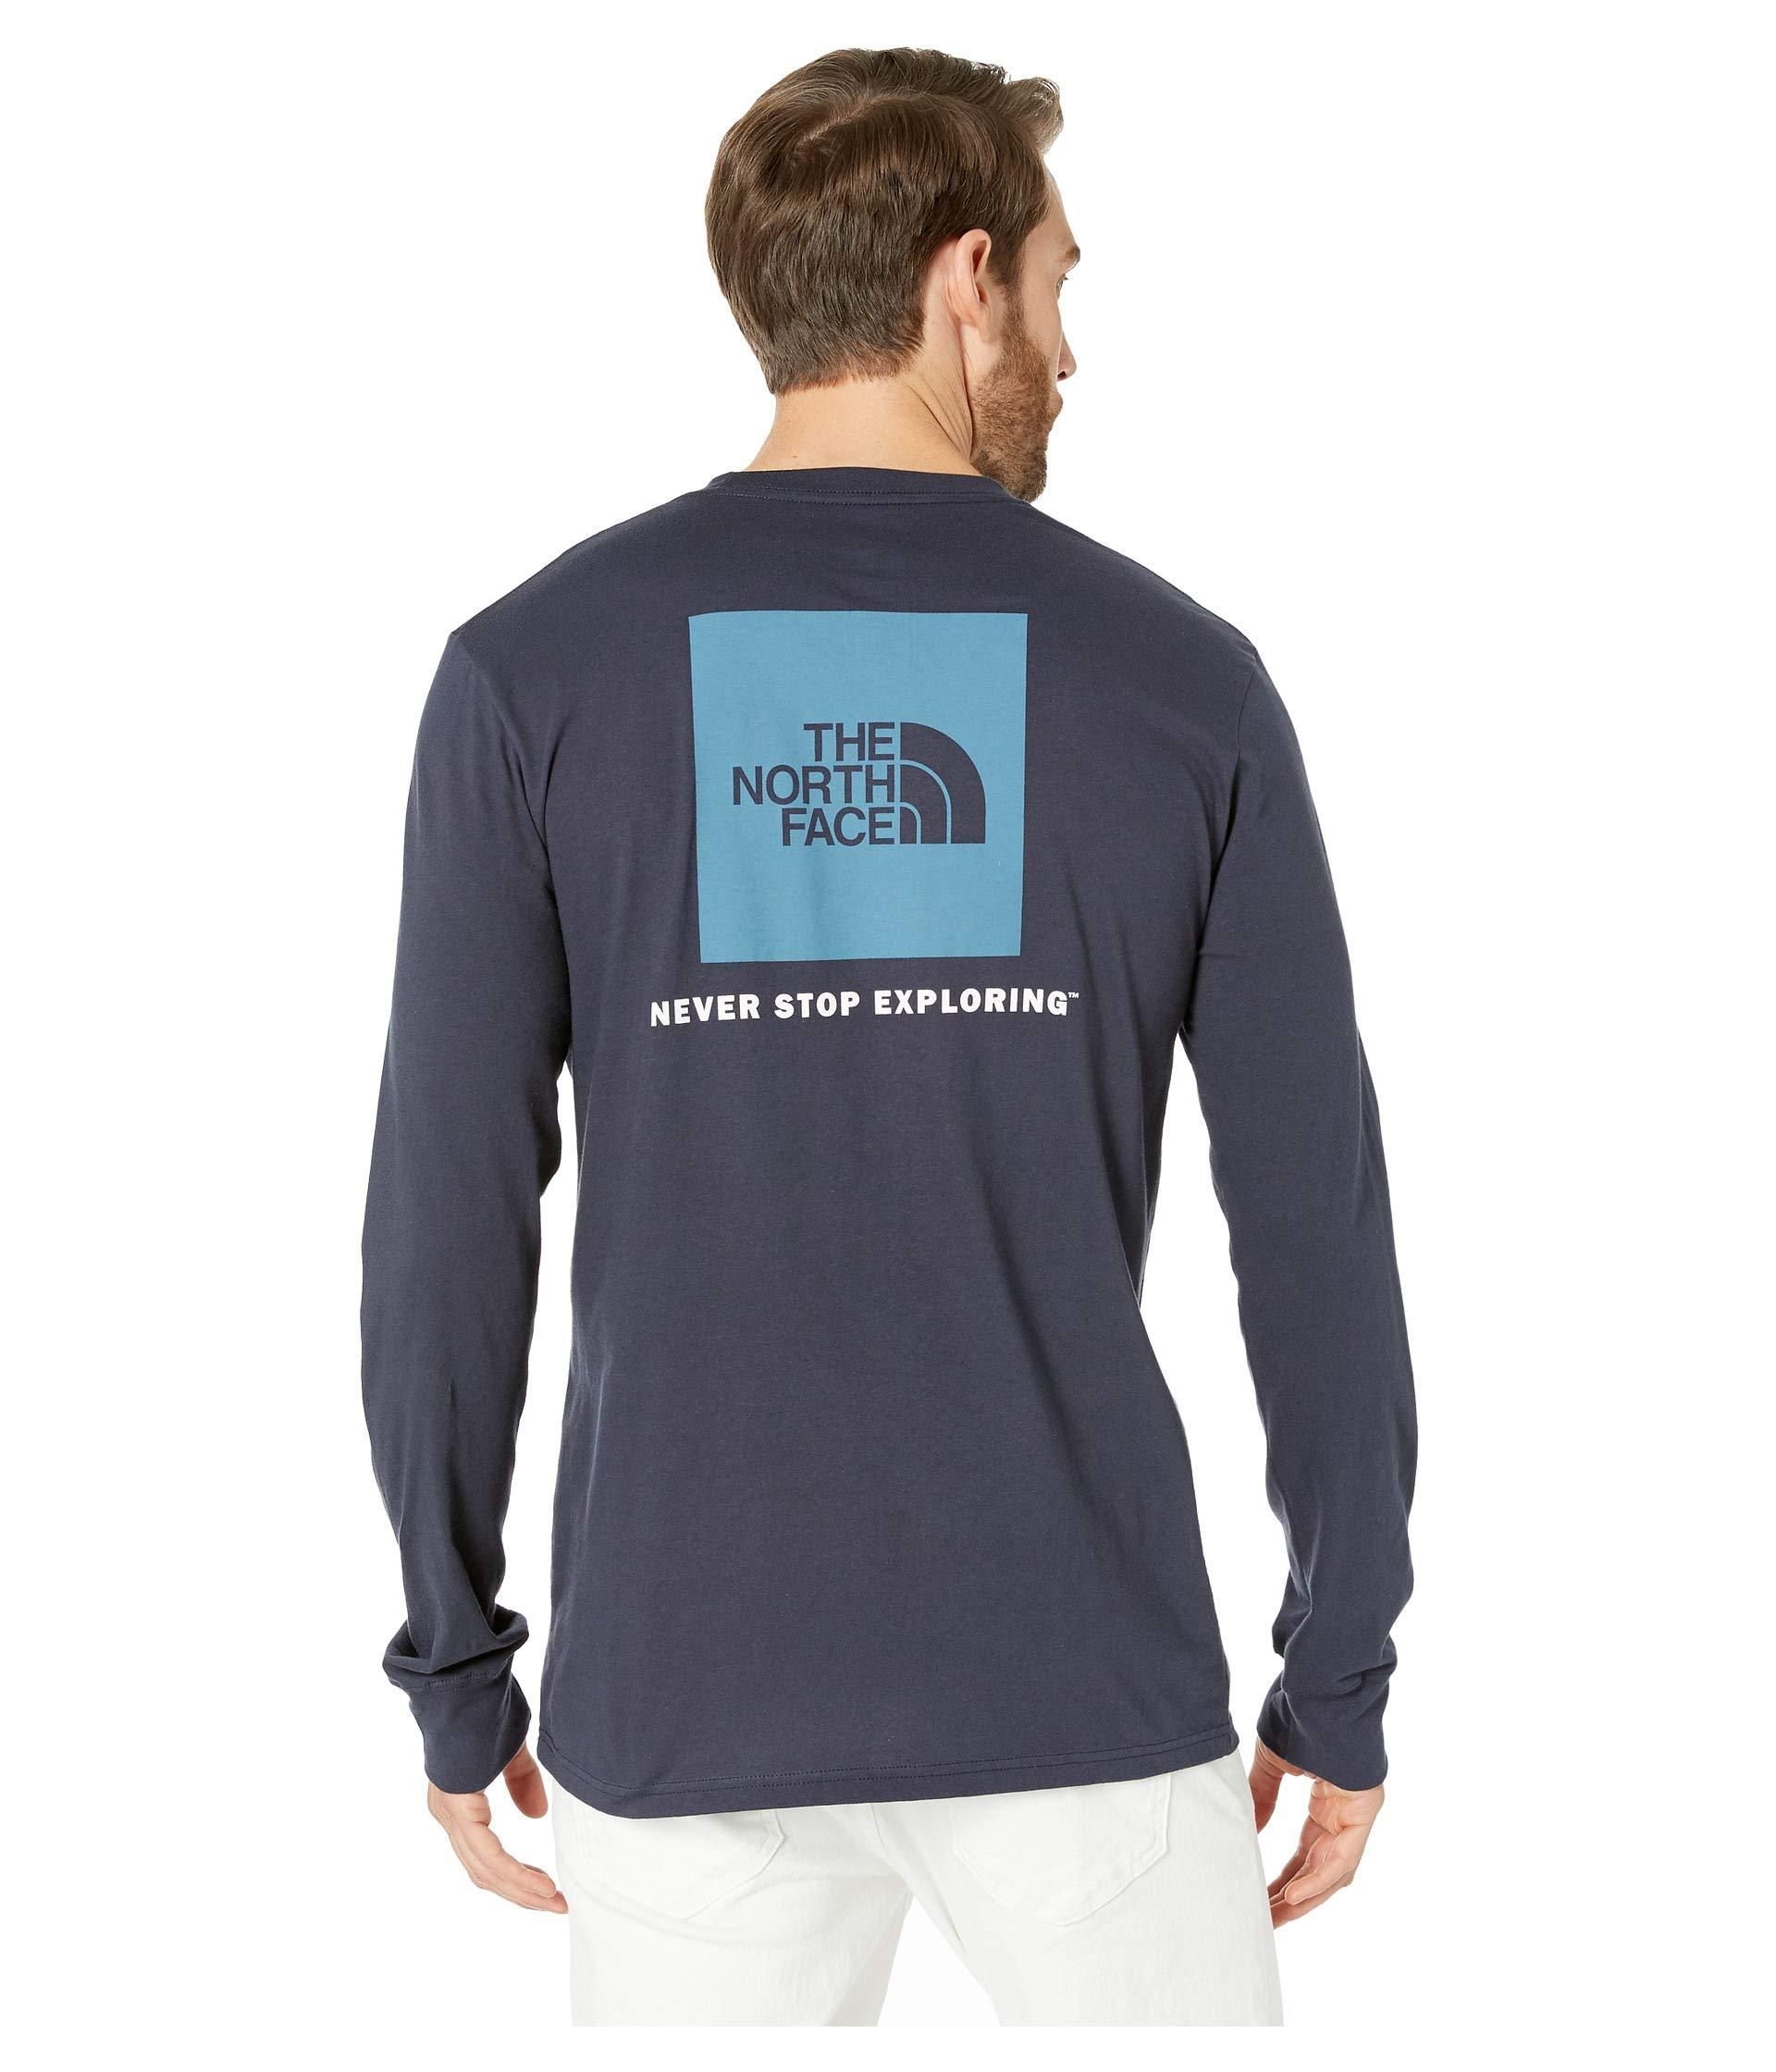 Keaac Women Long-Sleeved Letter Printed Hood Drawstring Jumper Sweatshirt Pullover